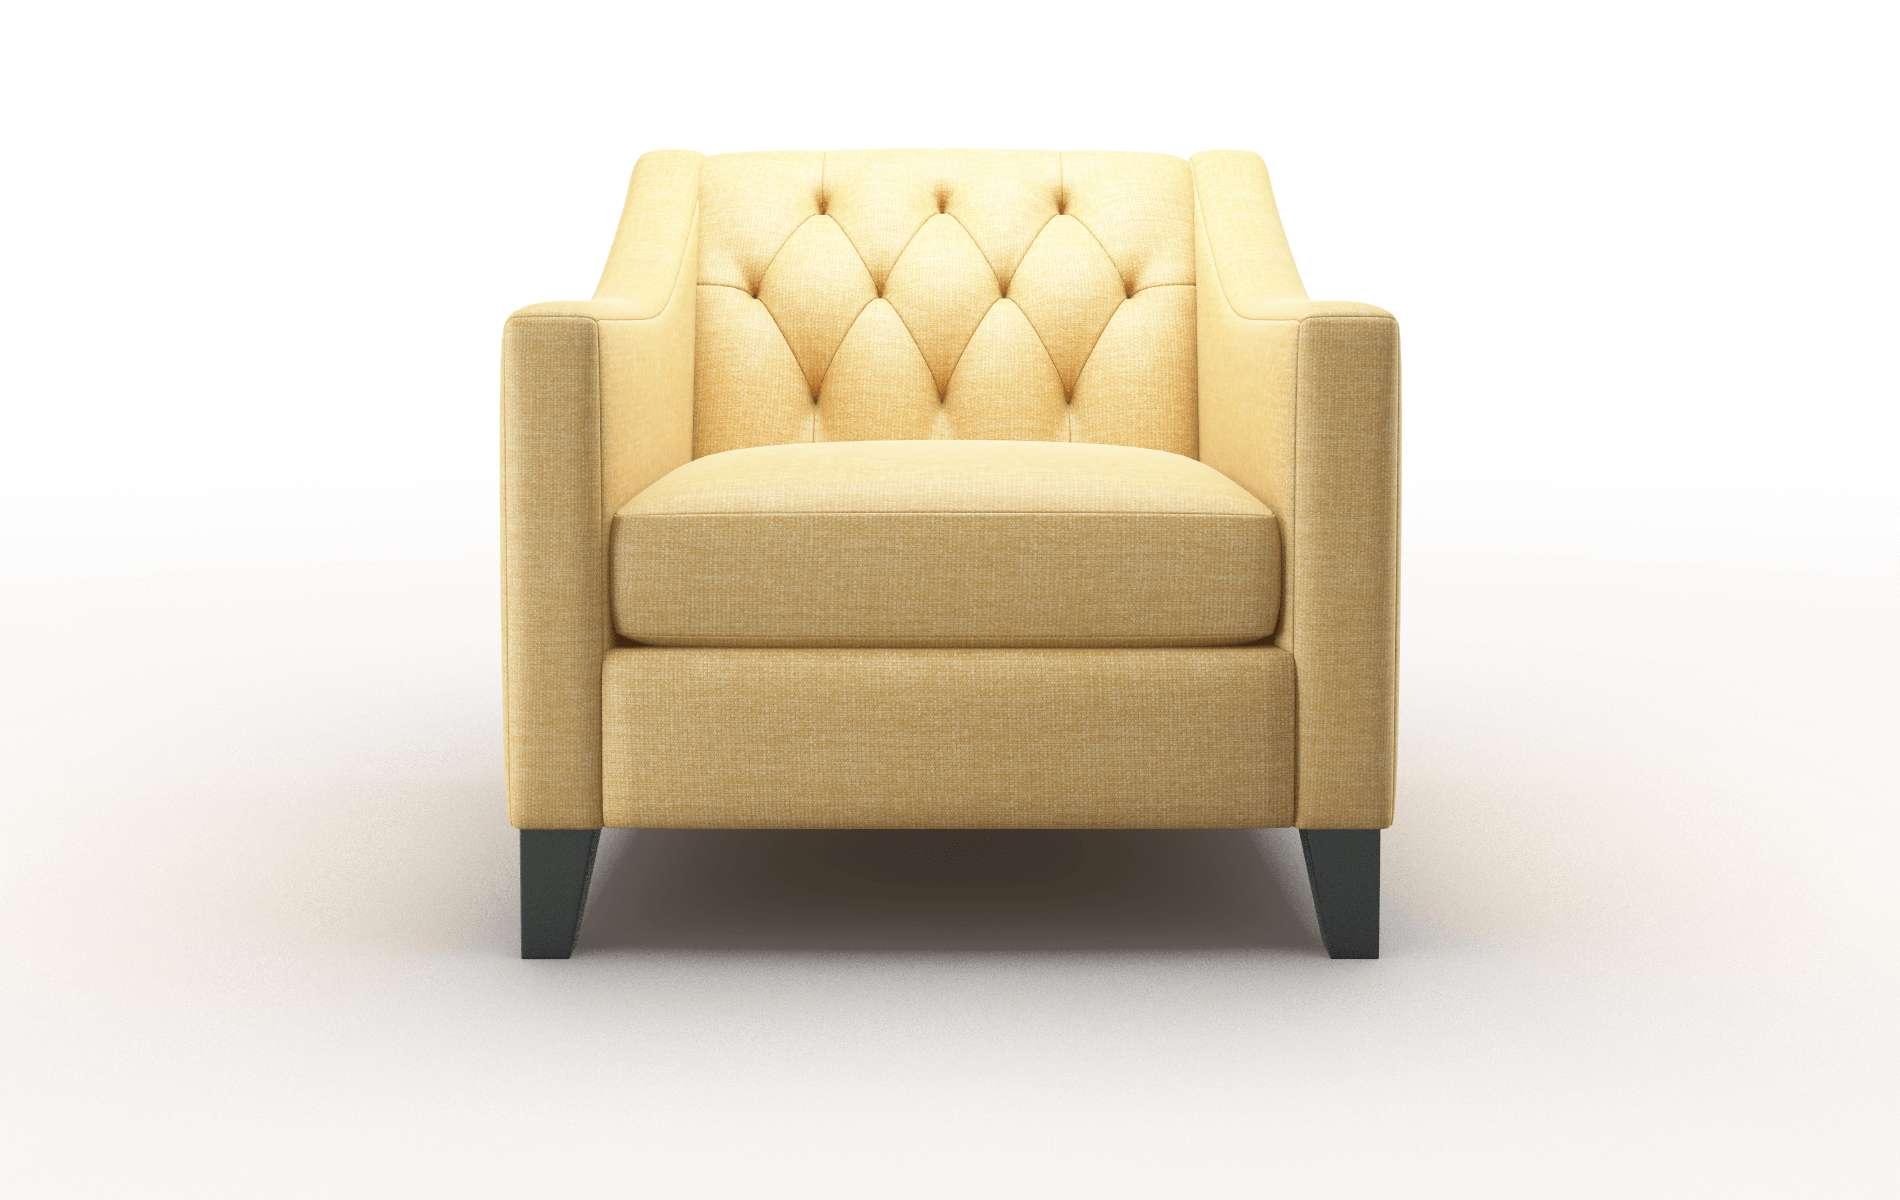 Seville Keylargo Honey Chair espresso legs 1